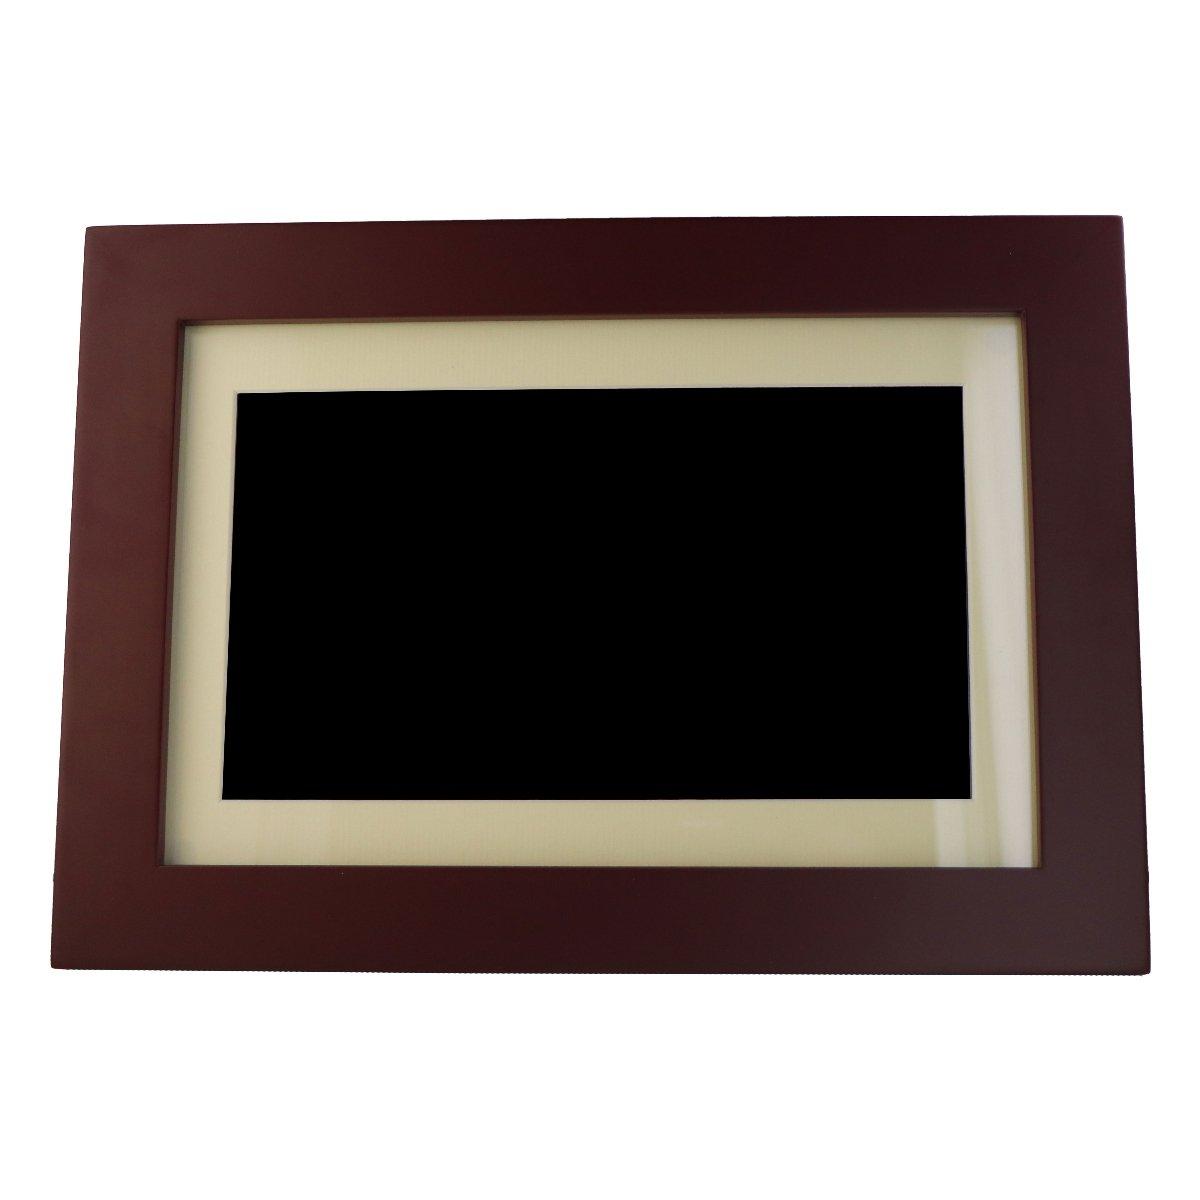 Insignia - 10 Widescreen LCD Digital Photo Frame - Espresso by Insignia